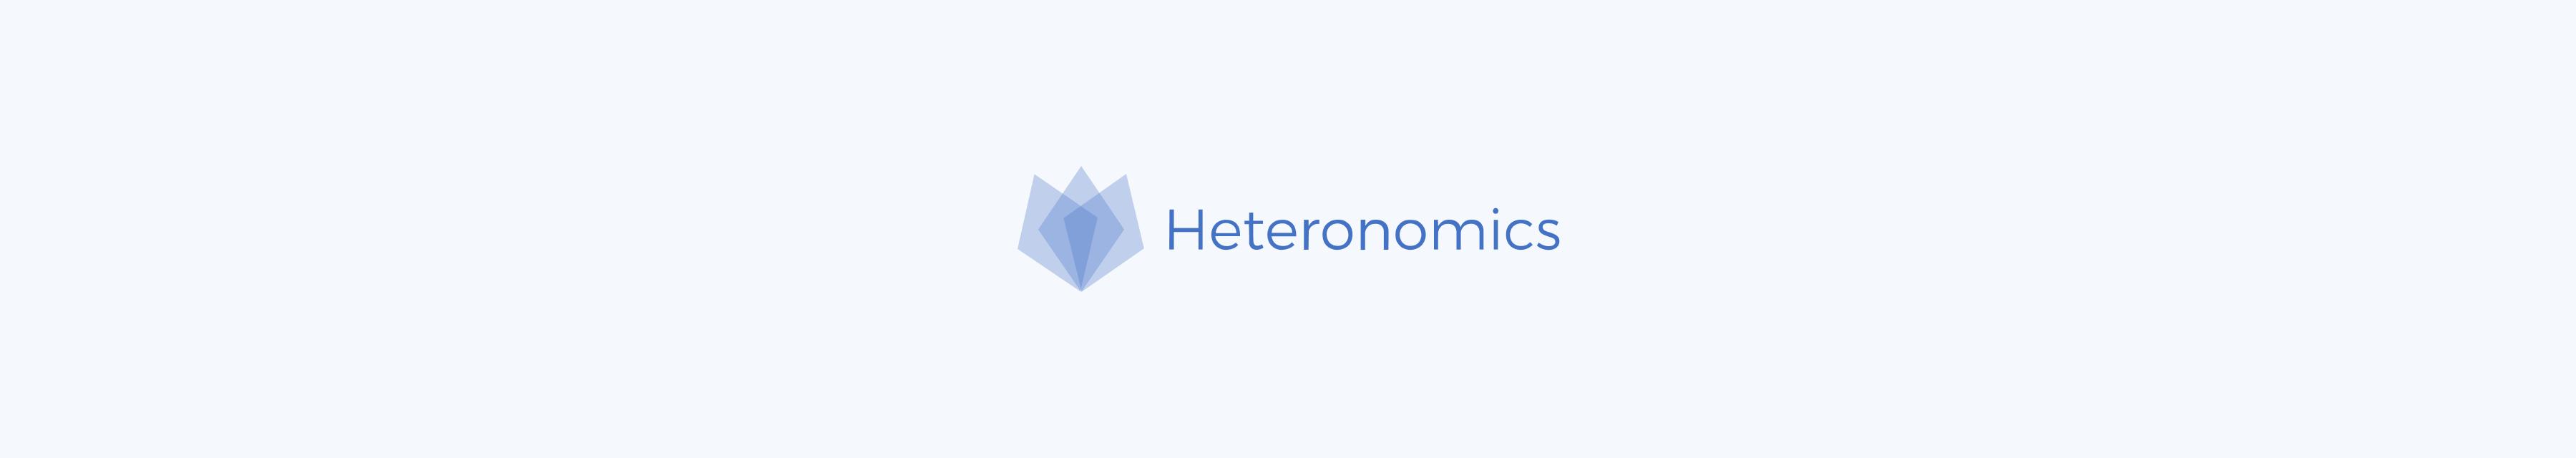 Heteronomics